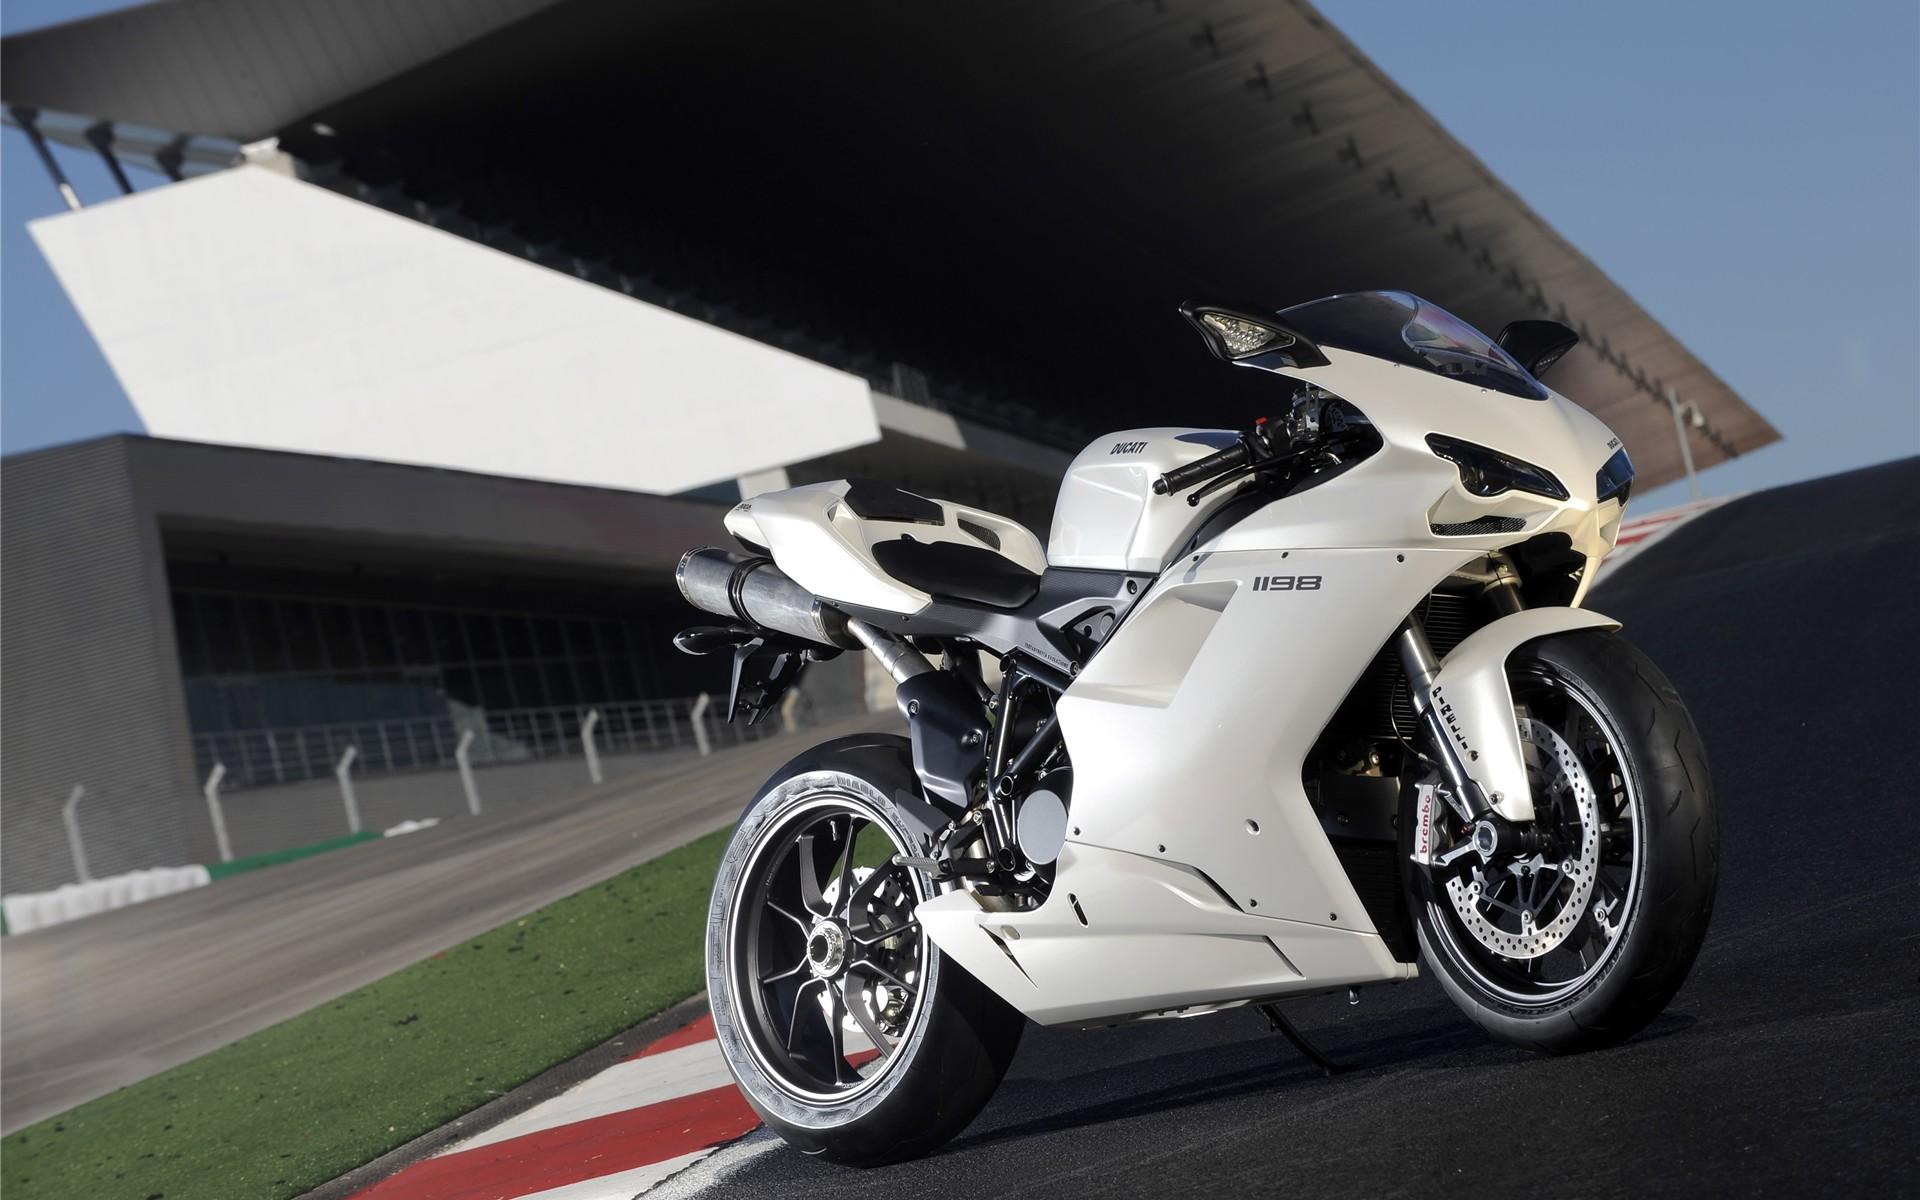 Ducati 1198 Wallpapers HD Wallpapers 1920x1200